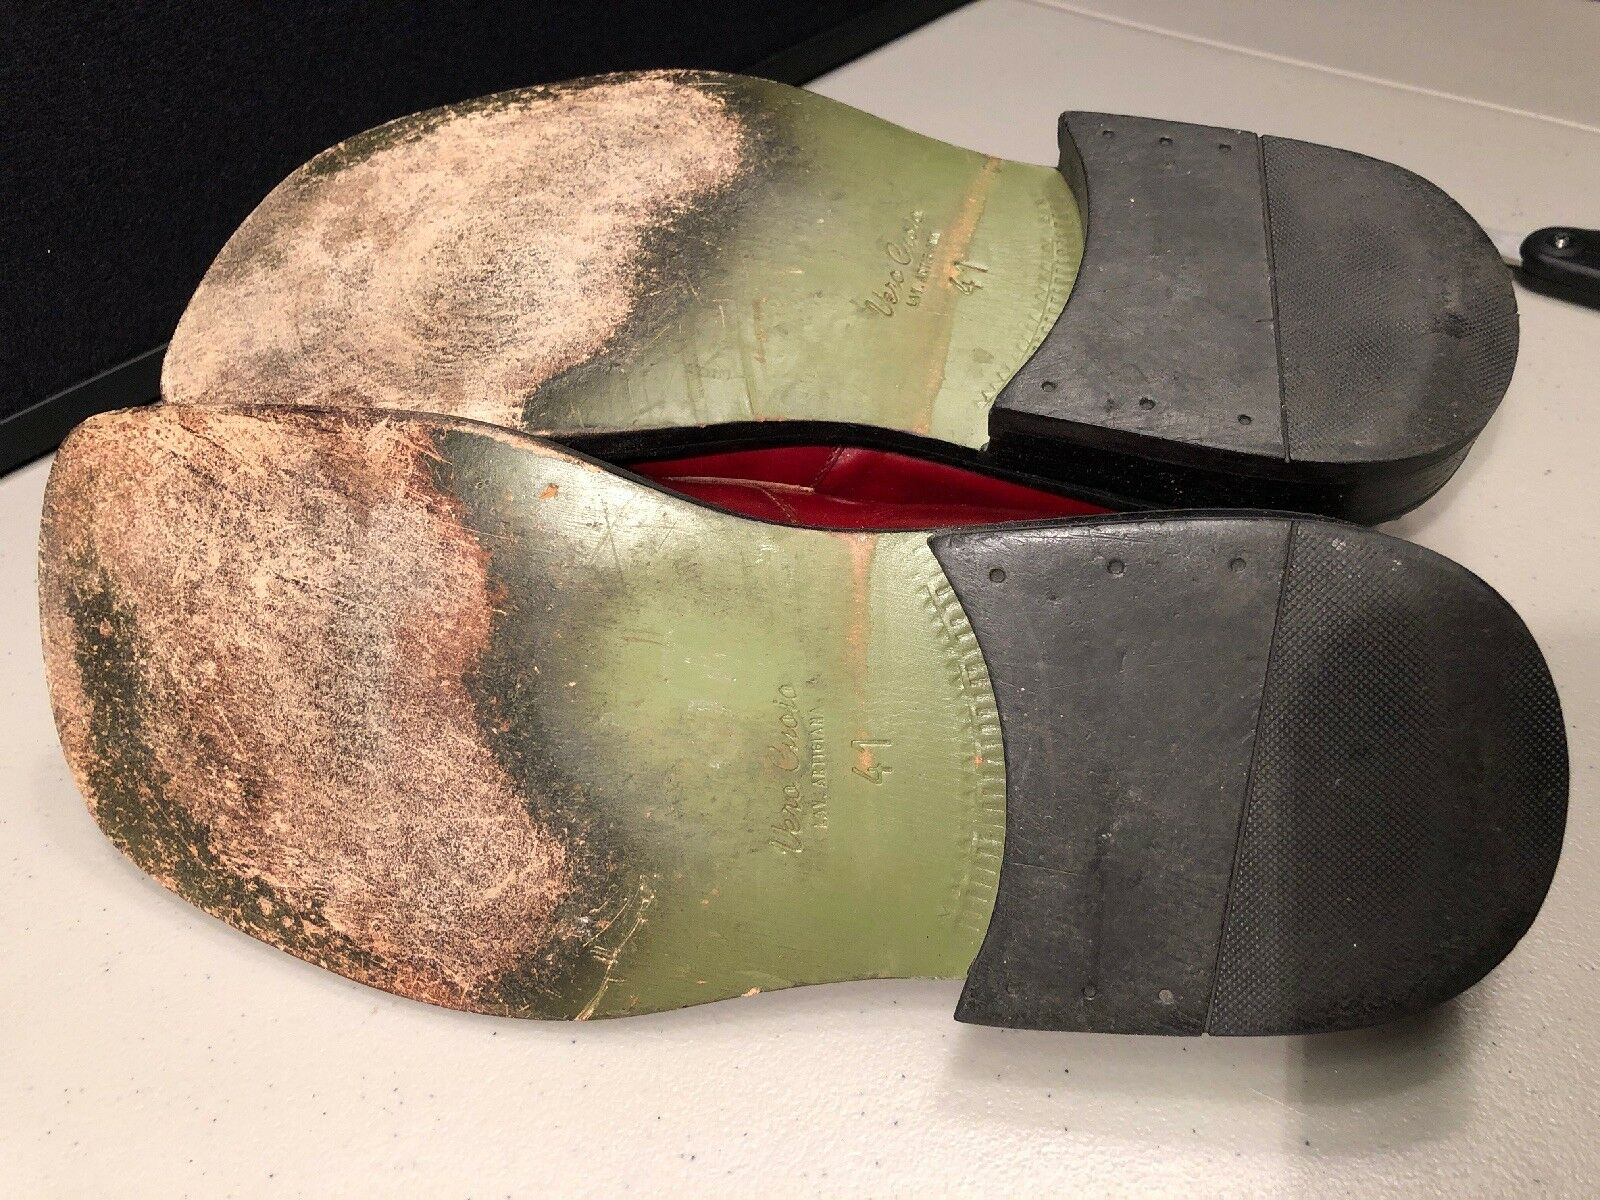 Men's Aldo Vero Cuoio rot rot rot Leather Loafers Größe 41  Größe 8 76d053